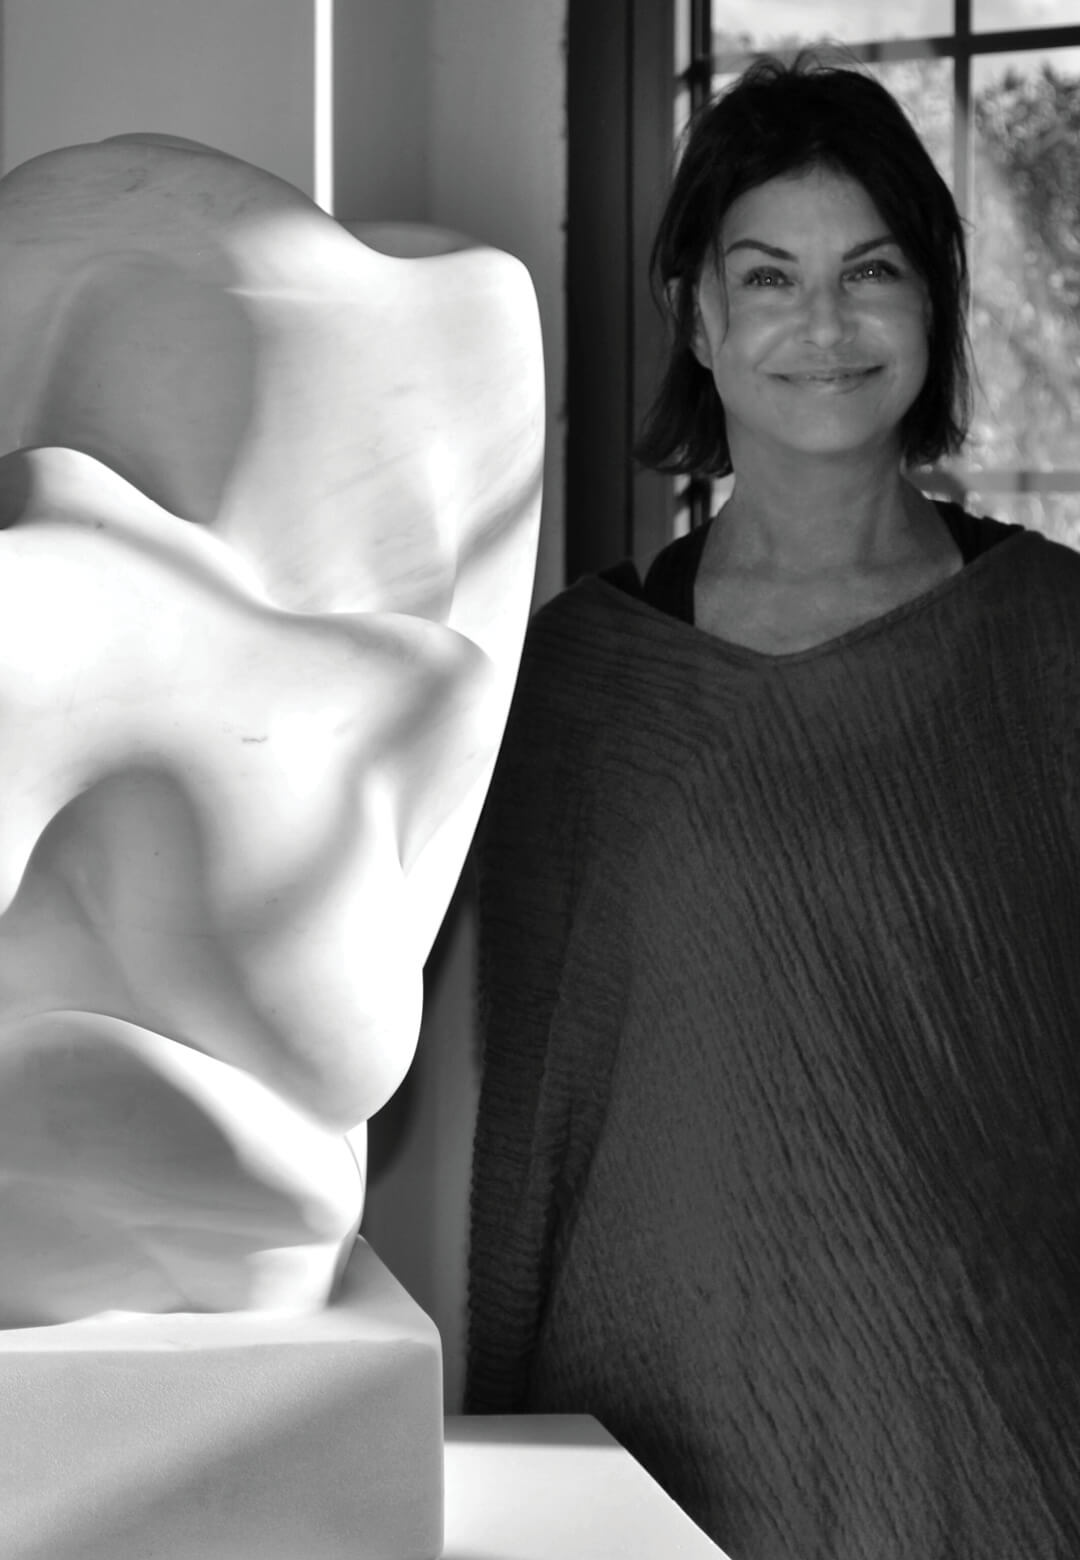 Artist Carolyn Frischling| STIRworld